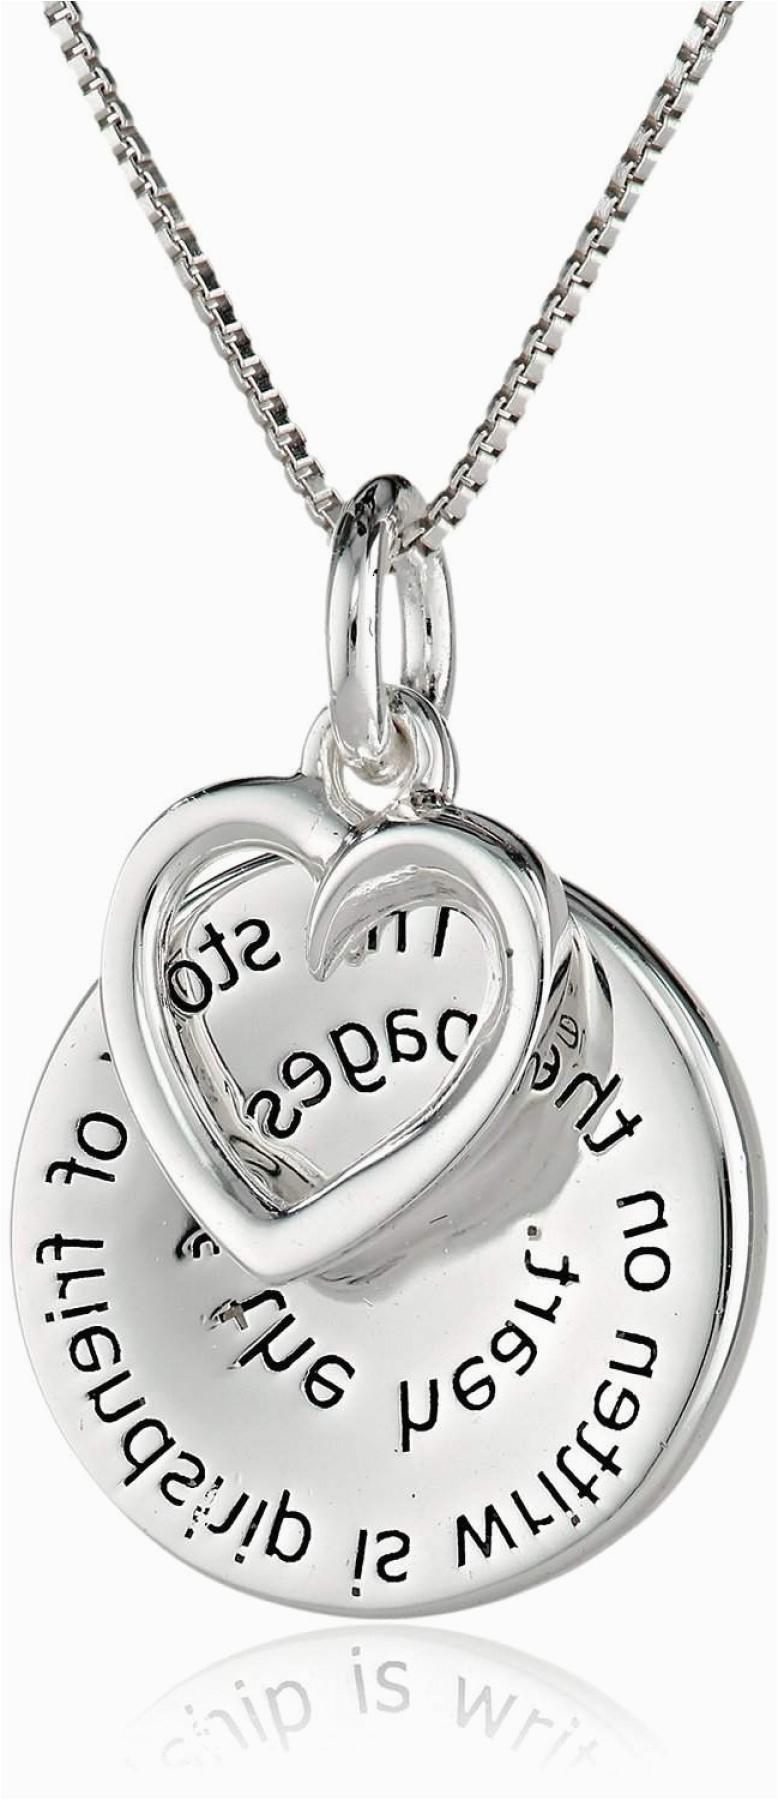 jewelry ideas for girlfriend caymancode